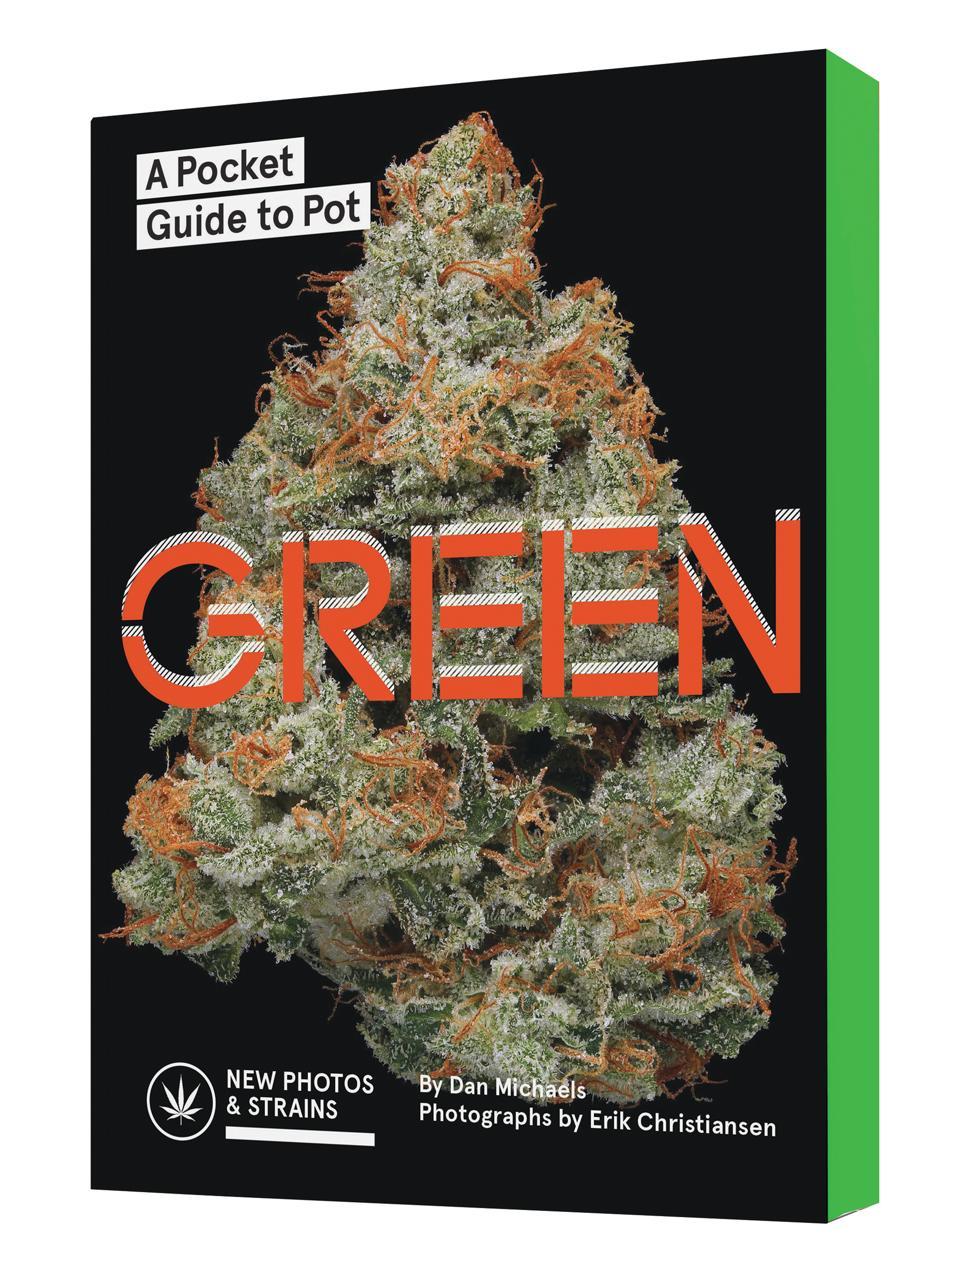 GREEN, Dan Michaels, Erik Christiansen, cannabis books, marijuana photography